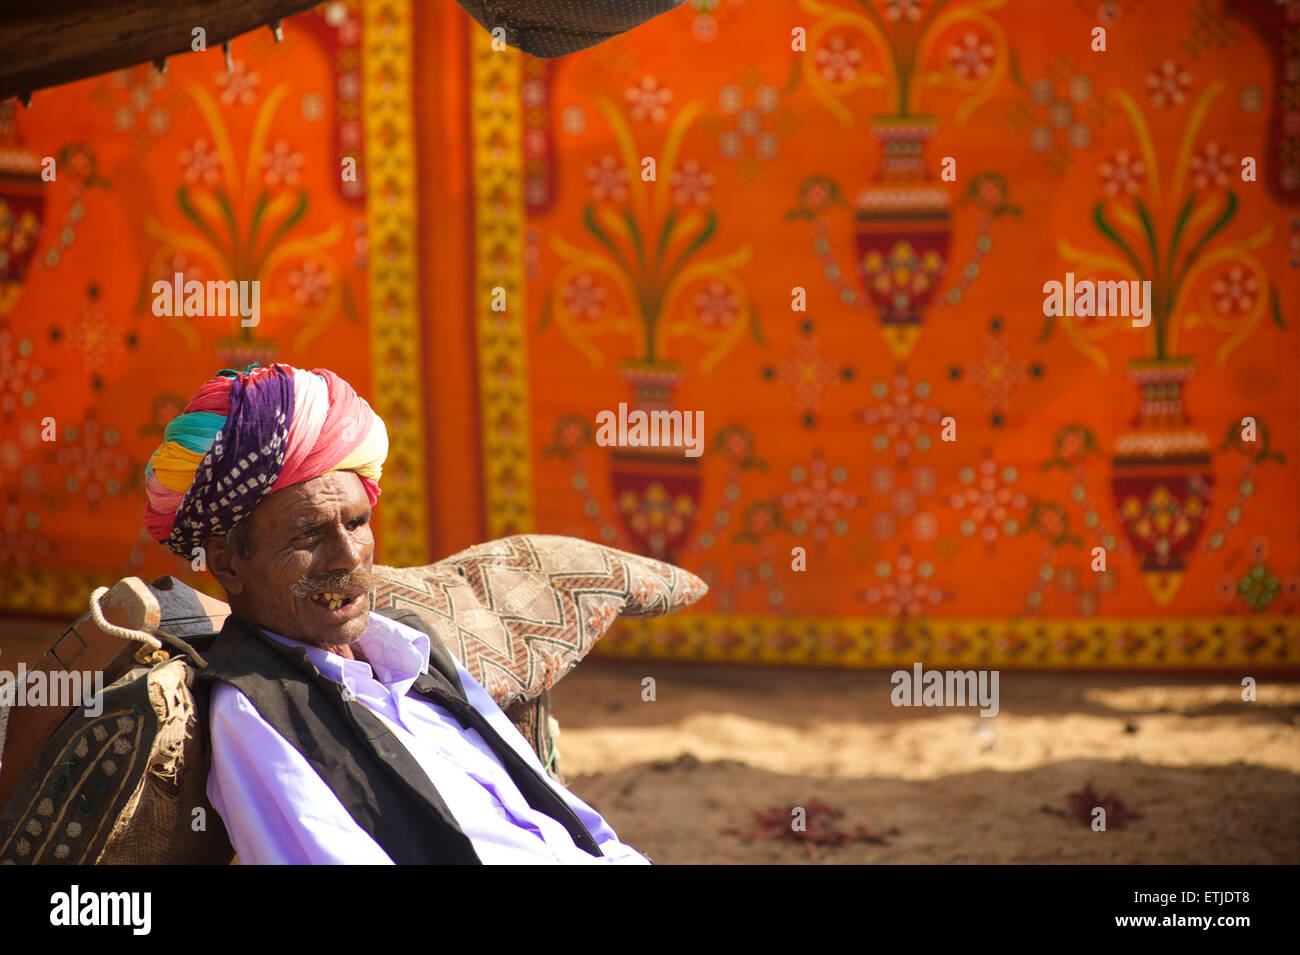 Uomo di Rajasthani relax presso il cammello di Pushkar Fair, Rajasthan, India Immagini Stock